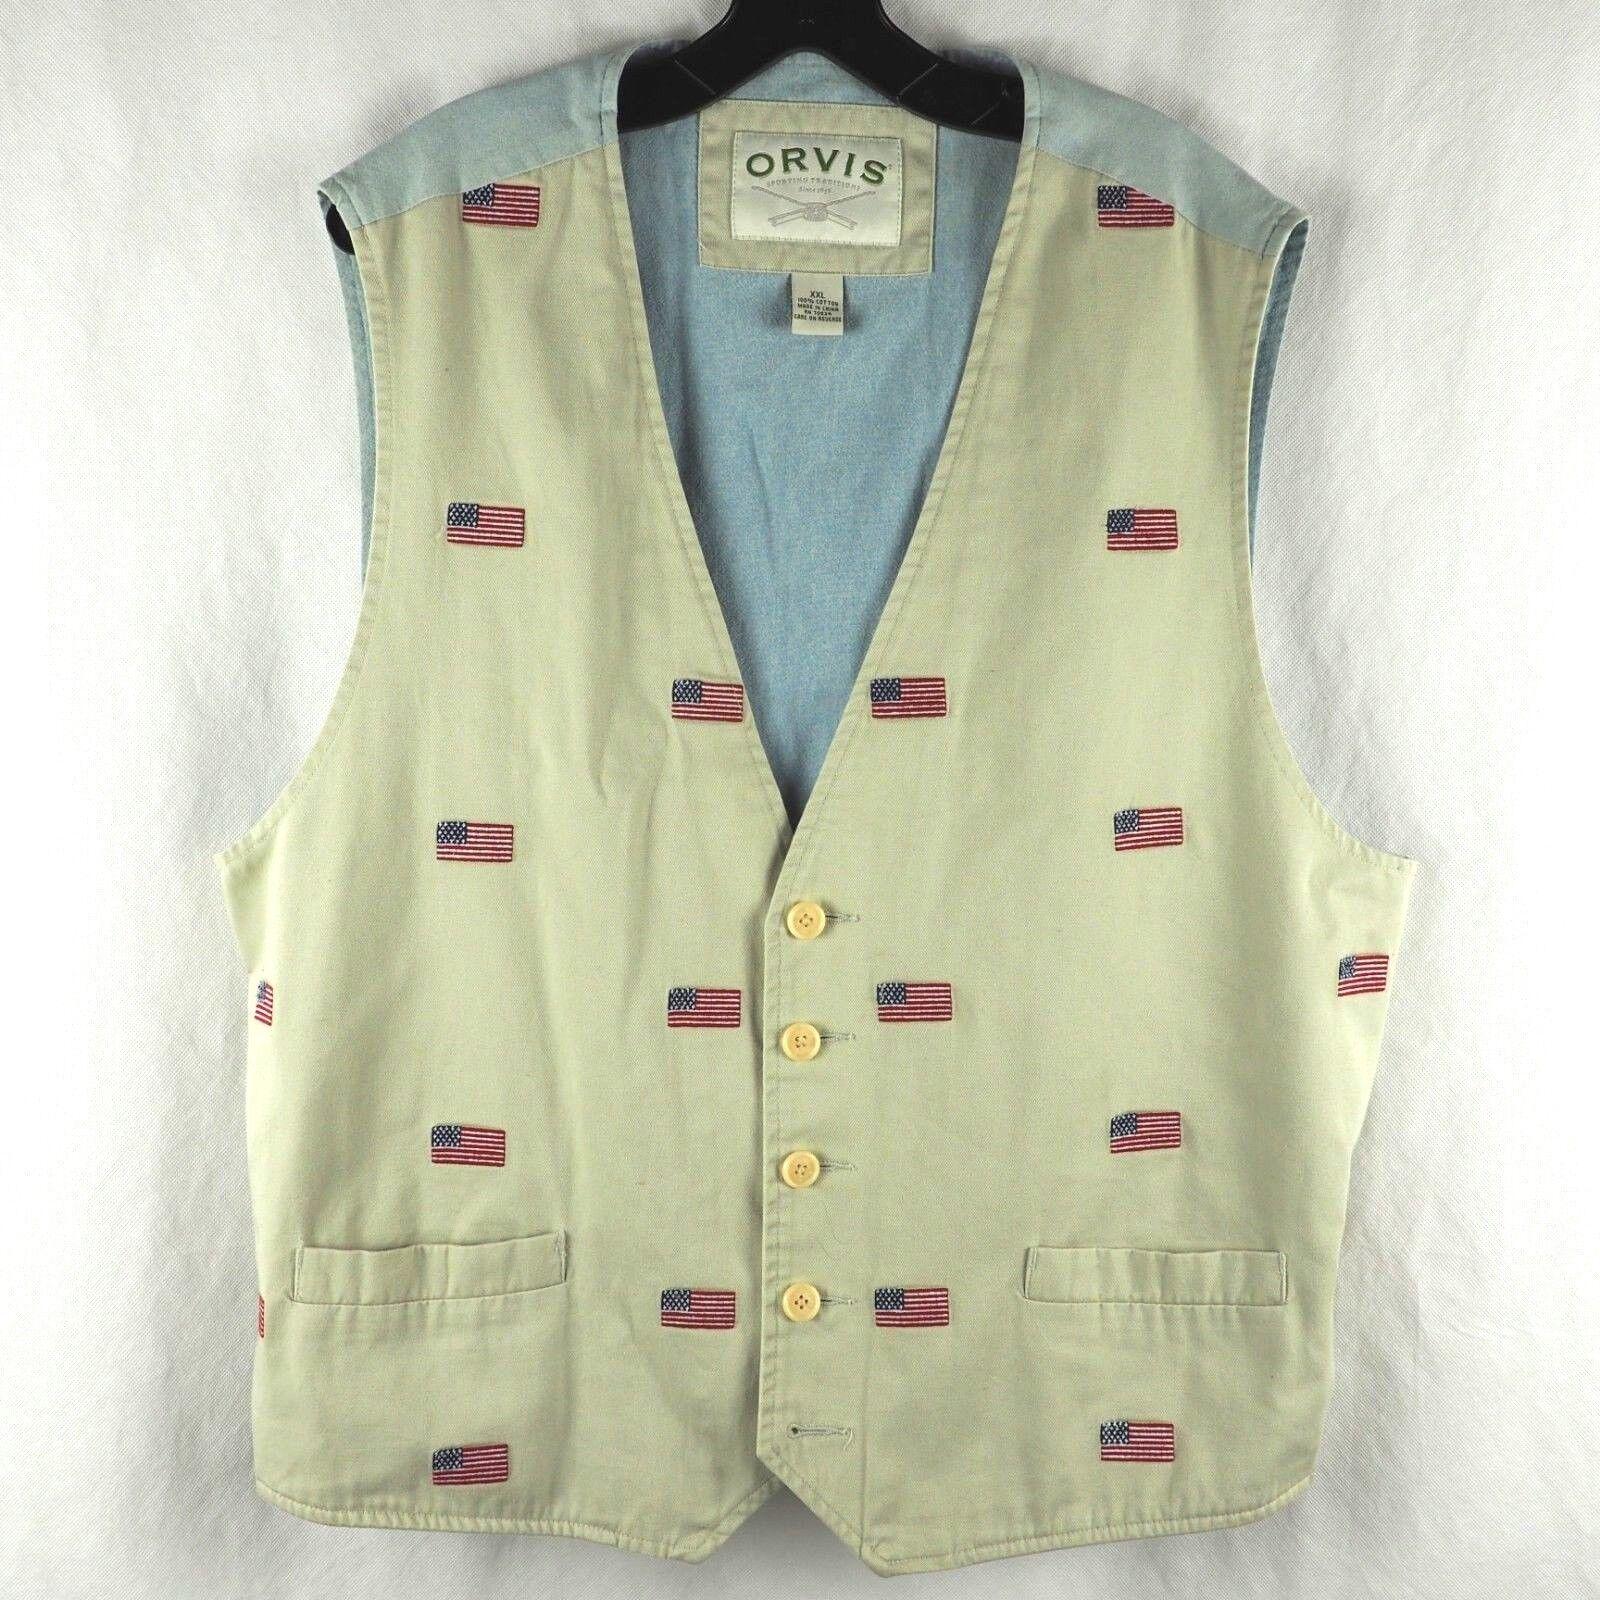 Orvis Men's Vest Fly Fishing USA American Flag Fish Cotton Light Beige bluee XXL